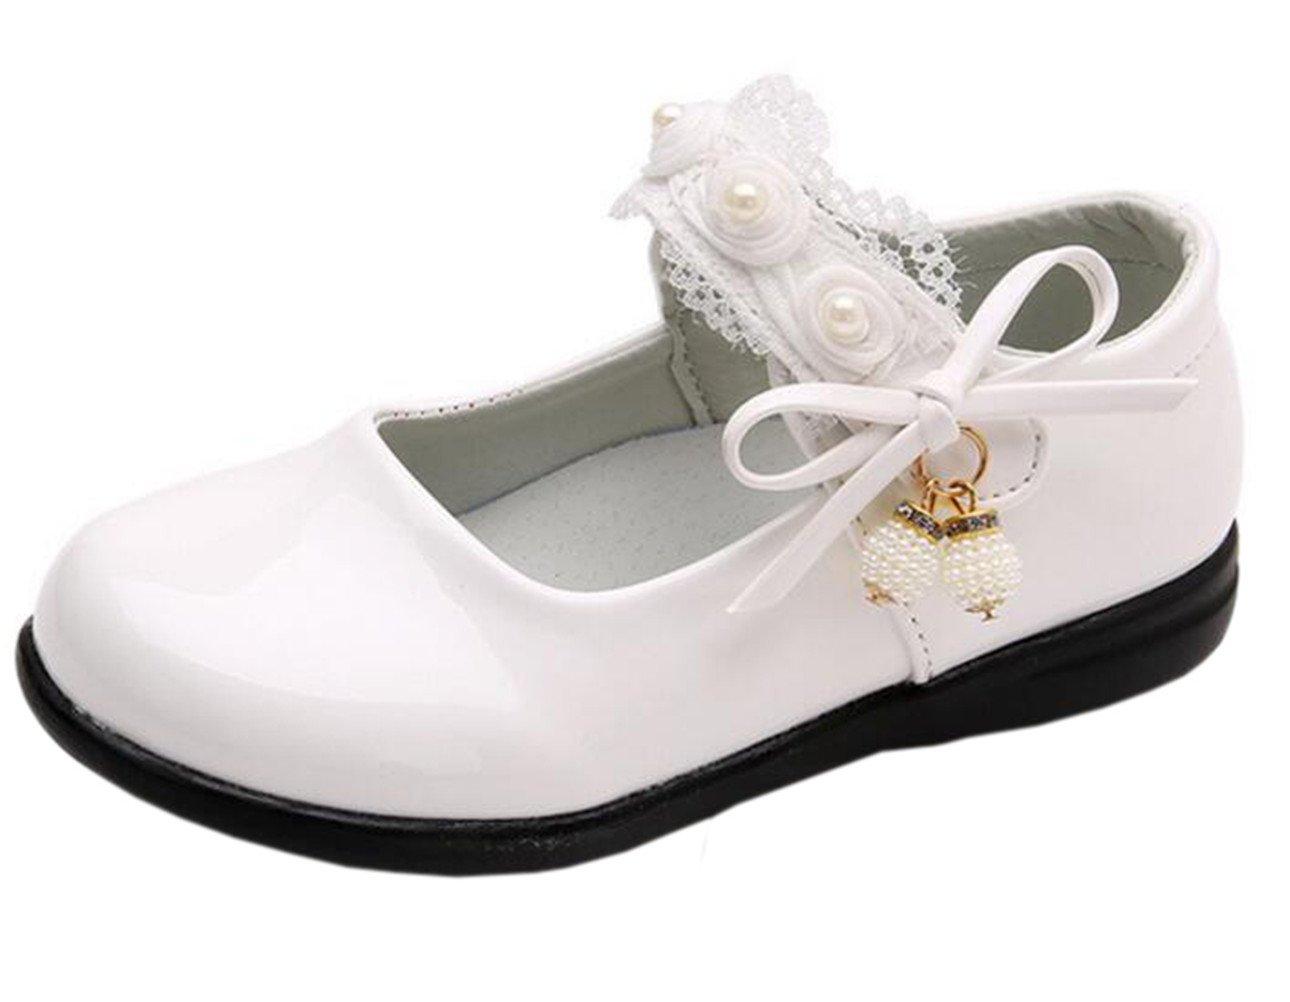 DADAWEN Girl's Strap School Uniform Dress Shoe Mary Jane Flat (Toddler/Little Kid) 70457